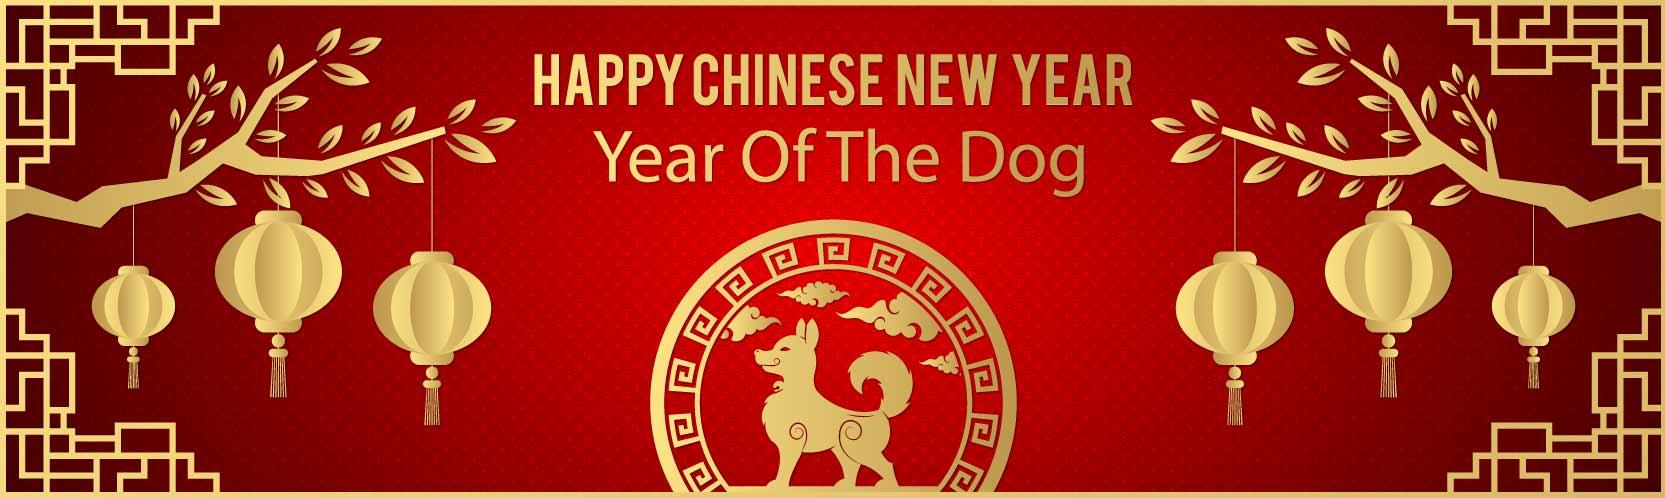 Imlek Celebrations Guide Voucher Eric Kayser Chinese New Year